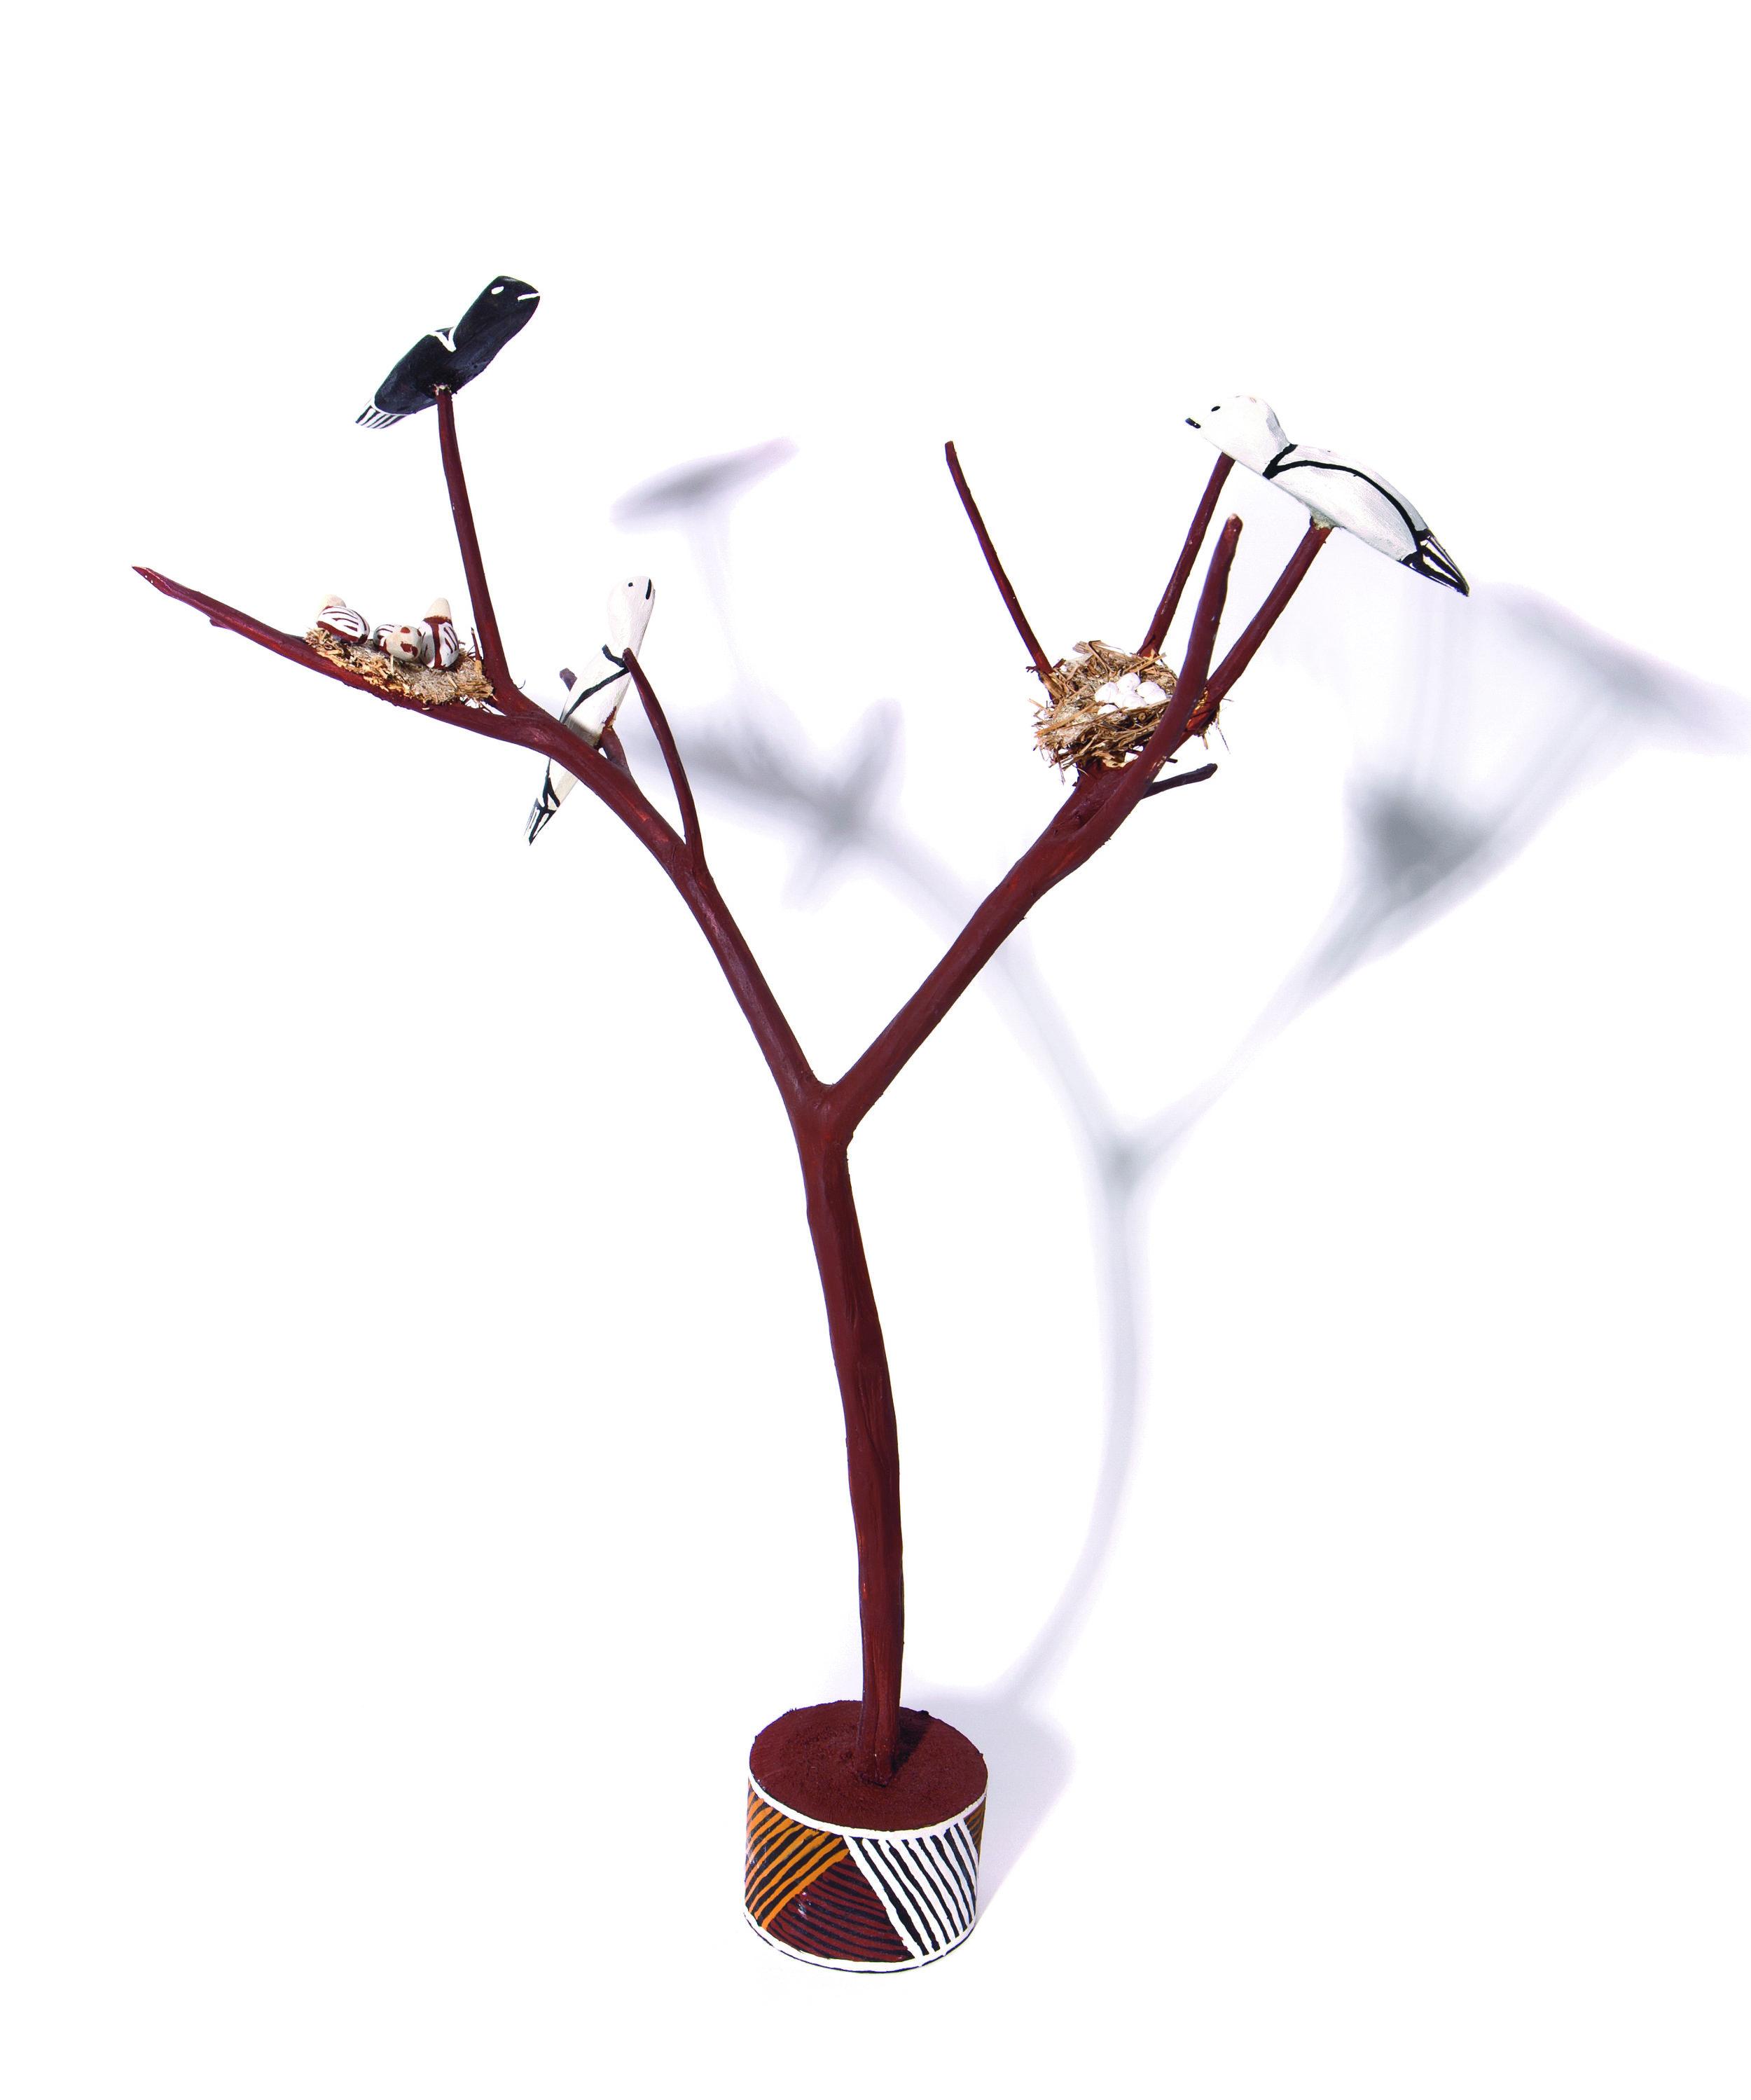 Naminapu Maymuru-White  Bird Tree  Natural earth pigments on hibiscus 60 cm Buku Larrnggay Mulka #4265M   EMAIL INQUIRY